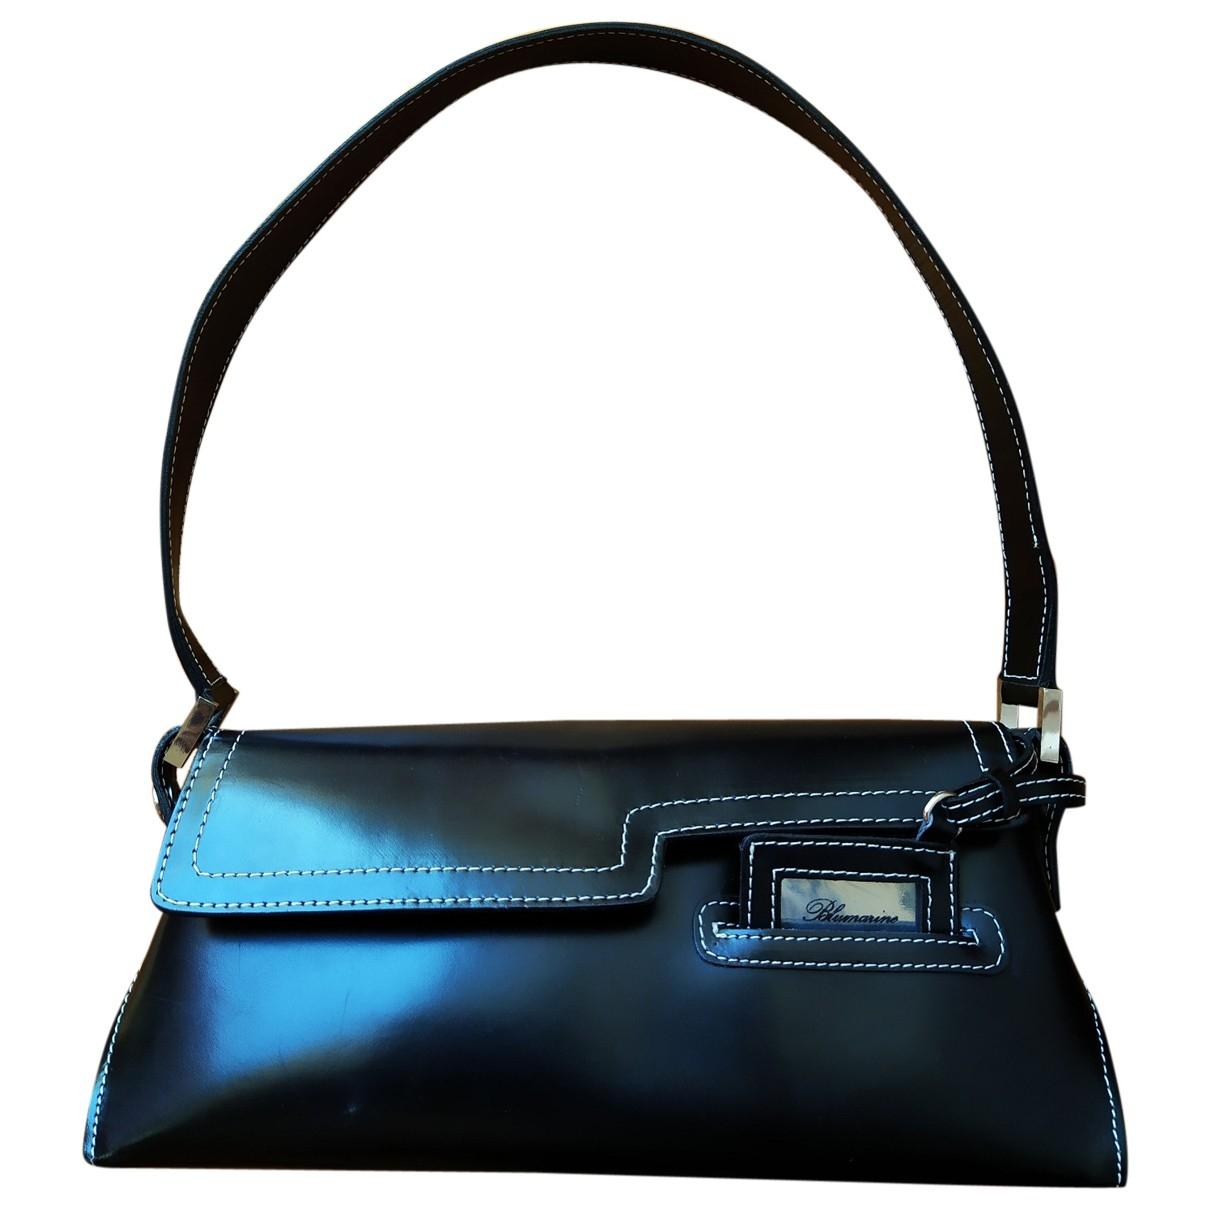 Blumarine \N Black Leather handbag for Women \N